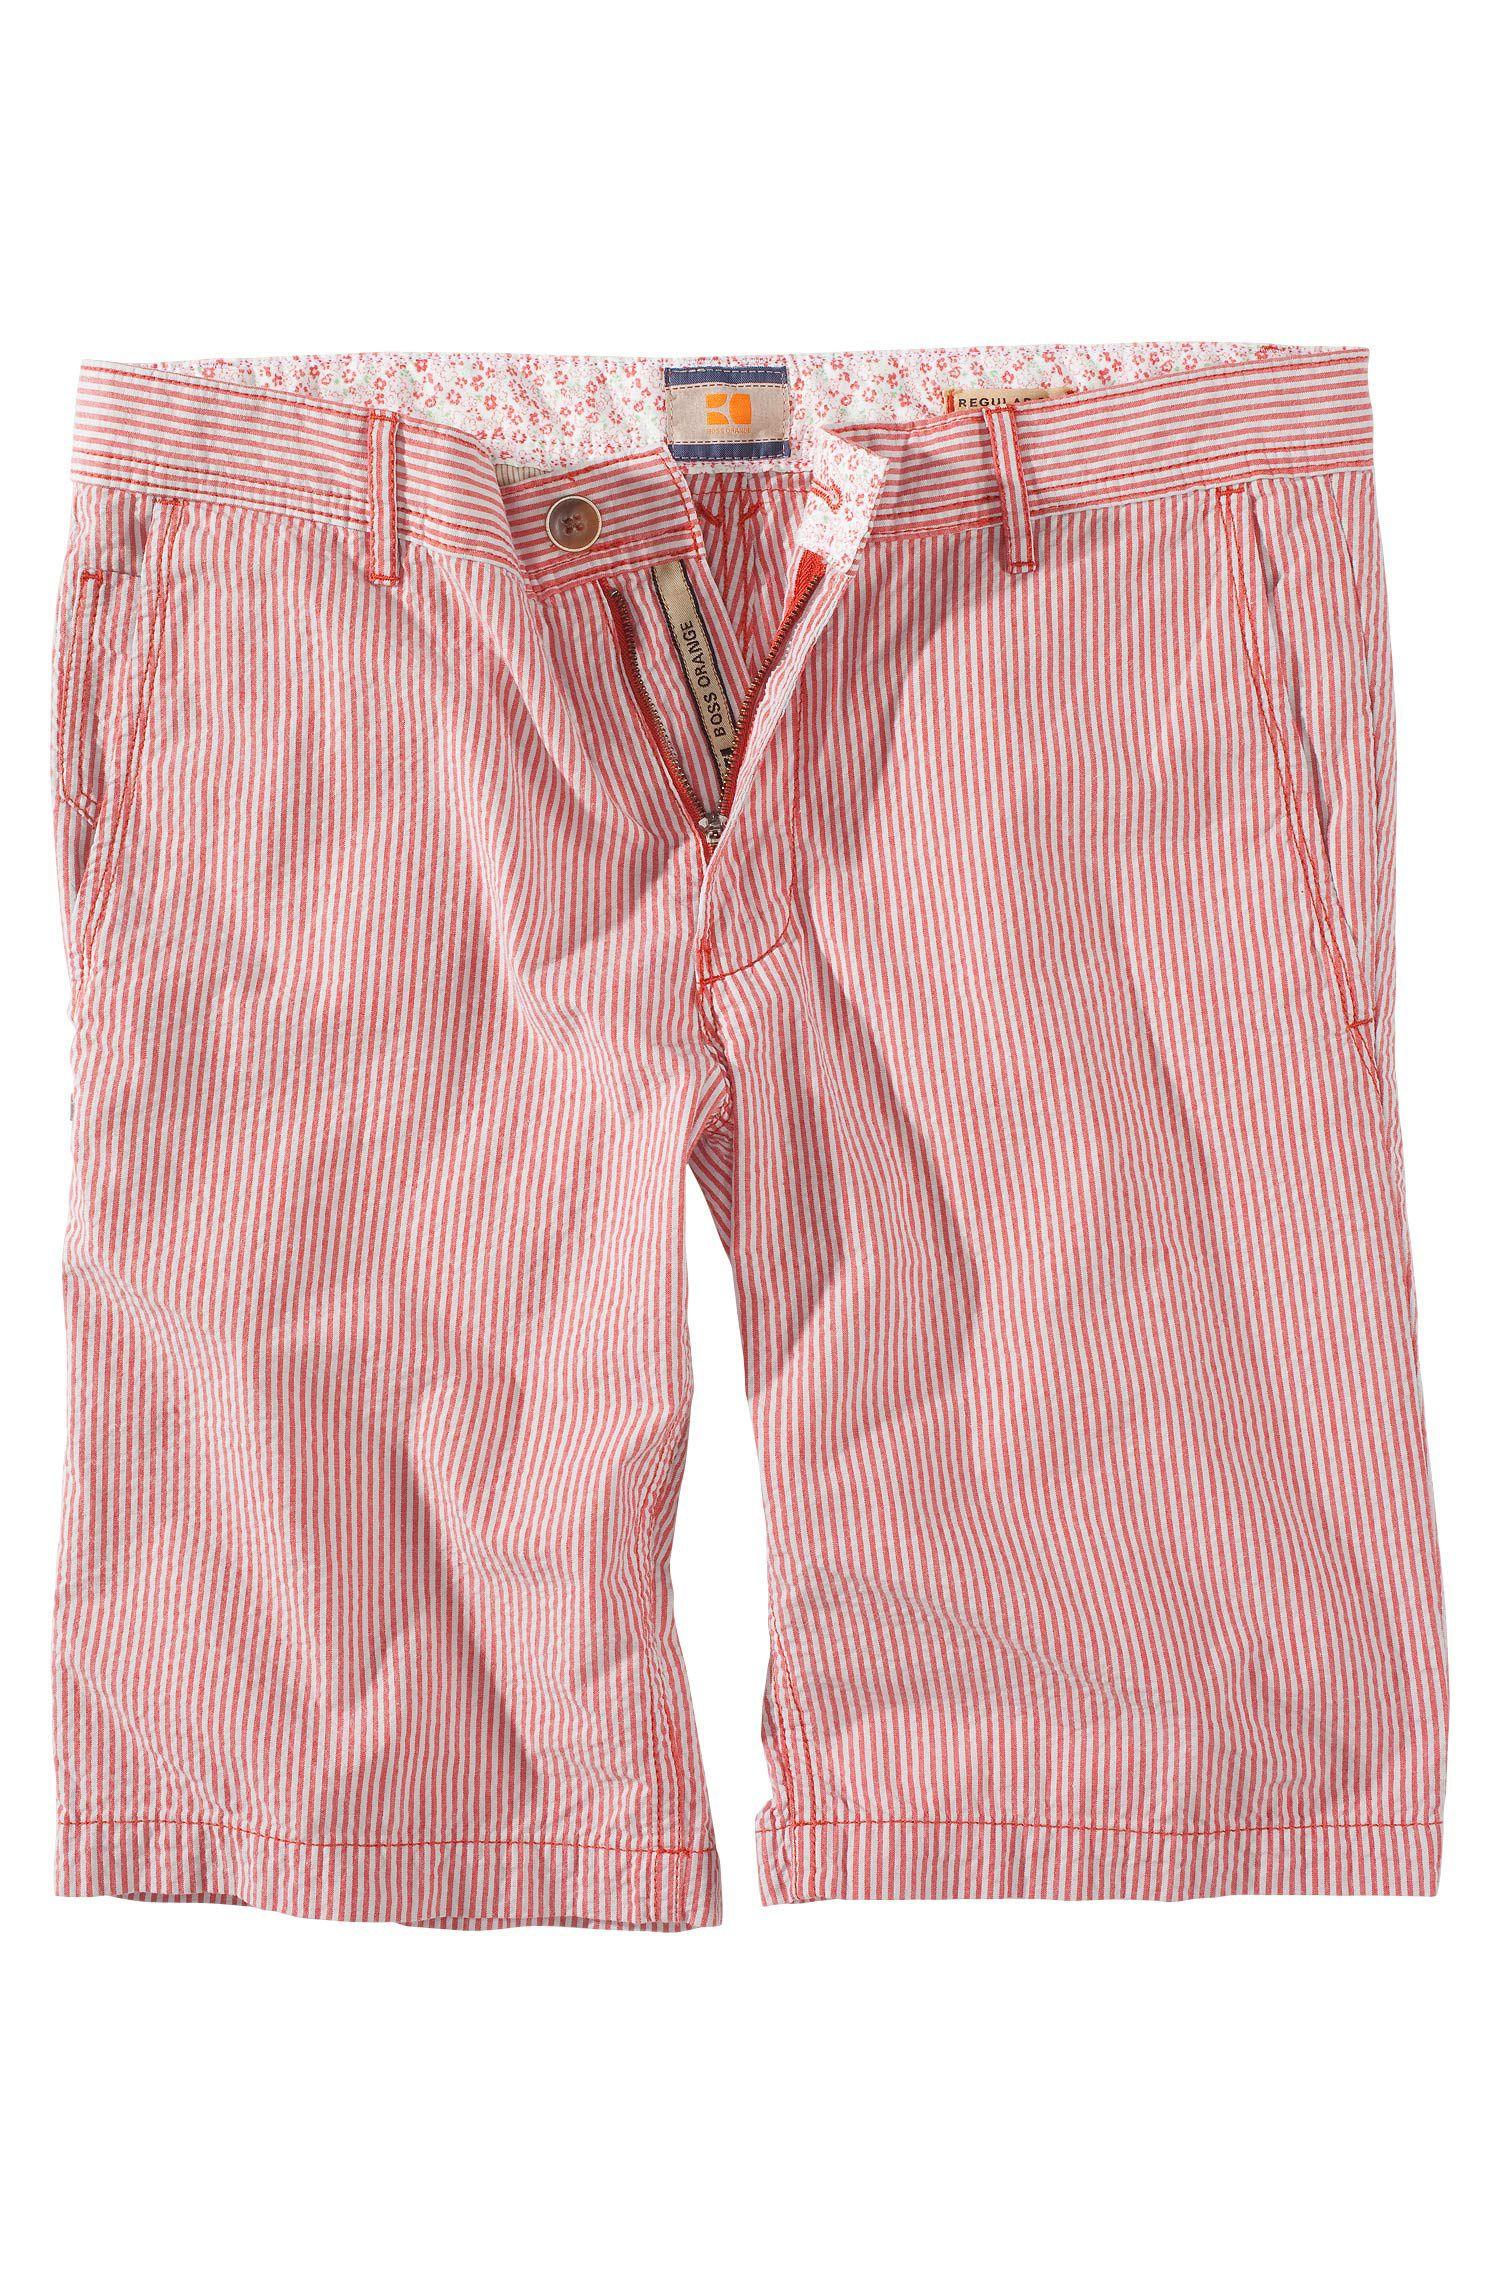 Short ´Shire2-Shorts-W` met strepen